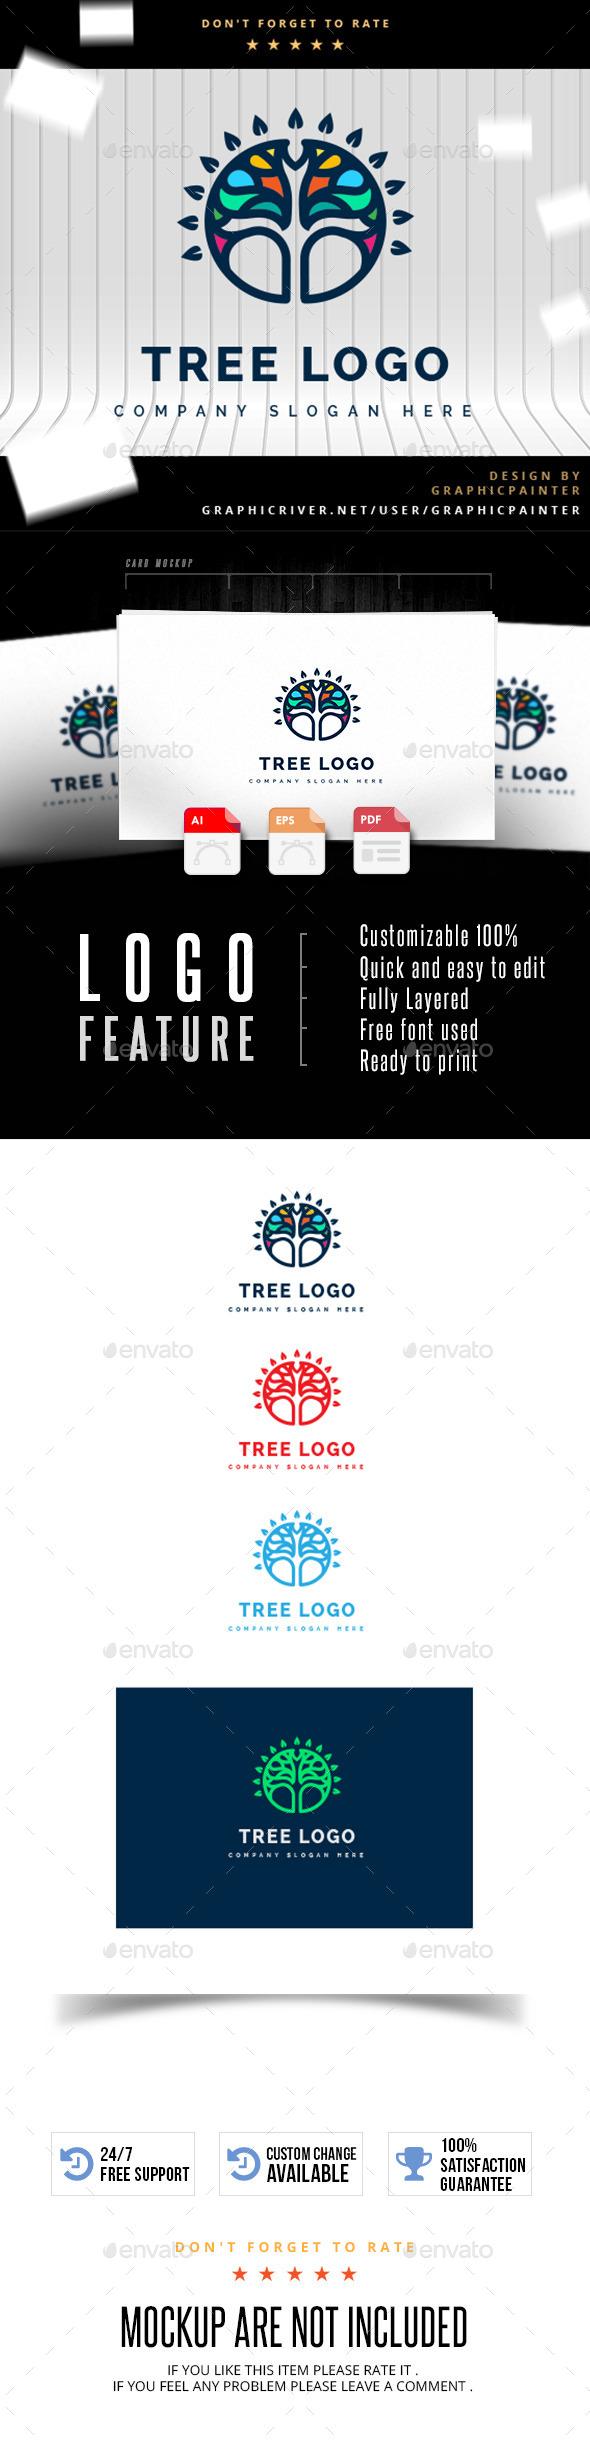 GraphicRiver Tree Logo 11224783